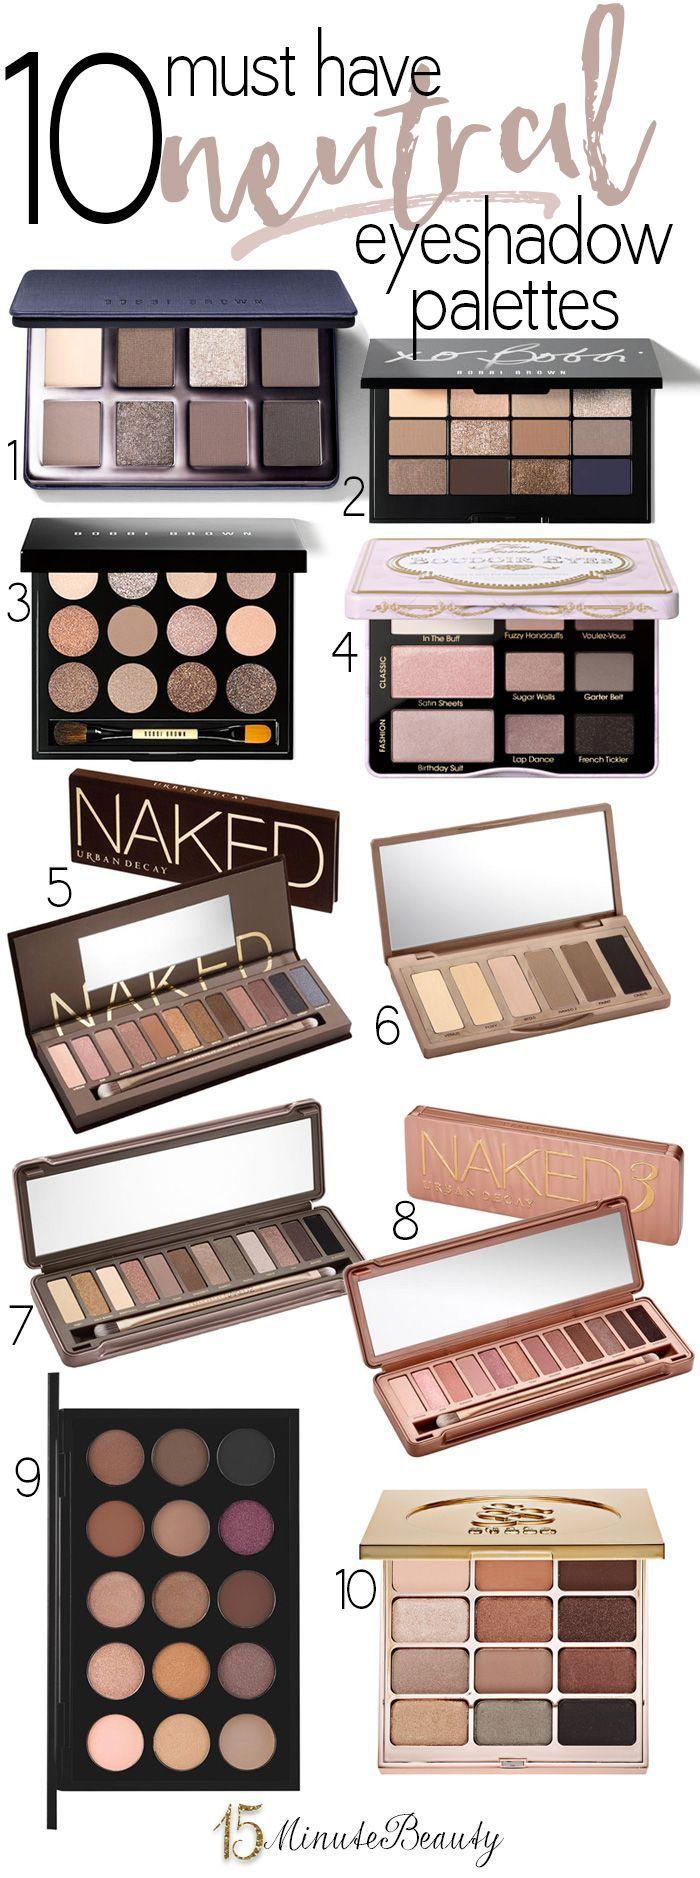 The best Neutral Eye Shadow Palettes!  They are soooo worth the splurge.